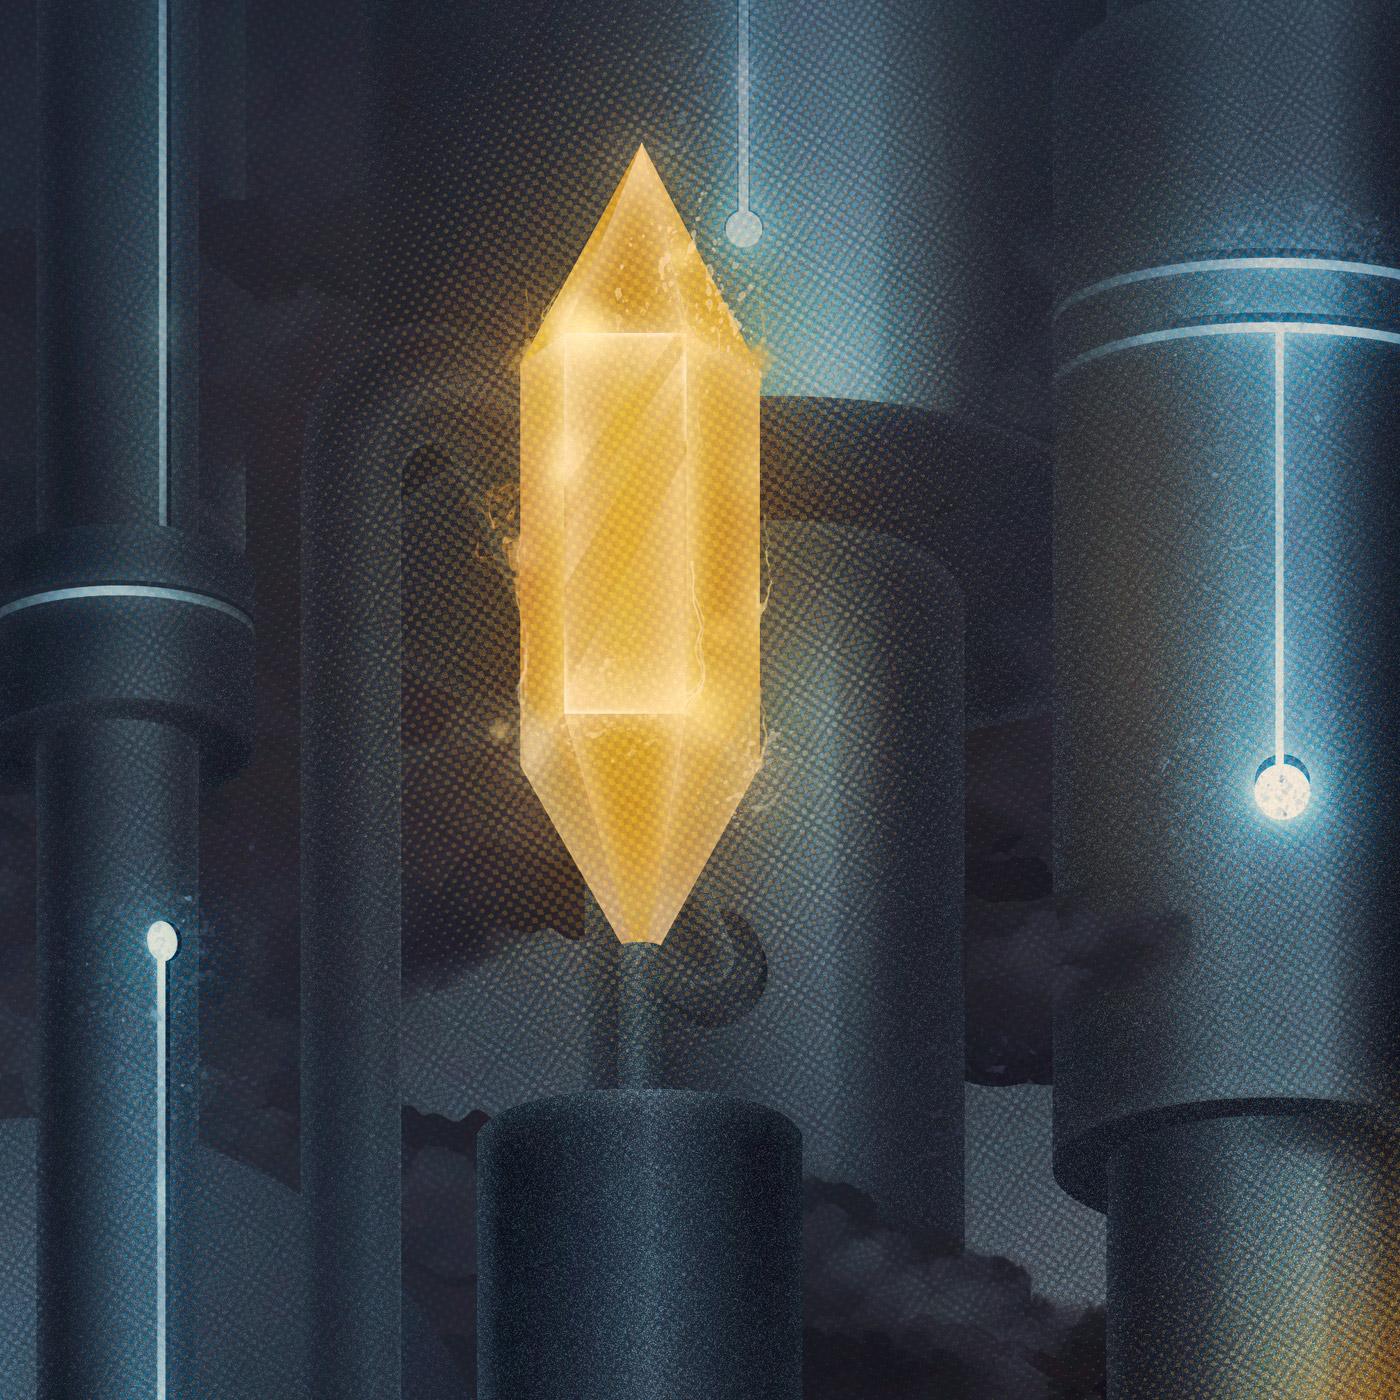 crystal-detail-1